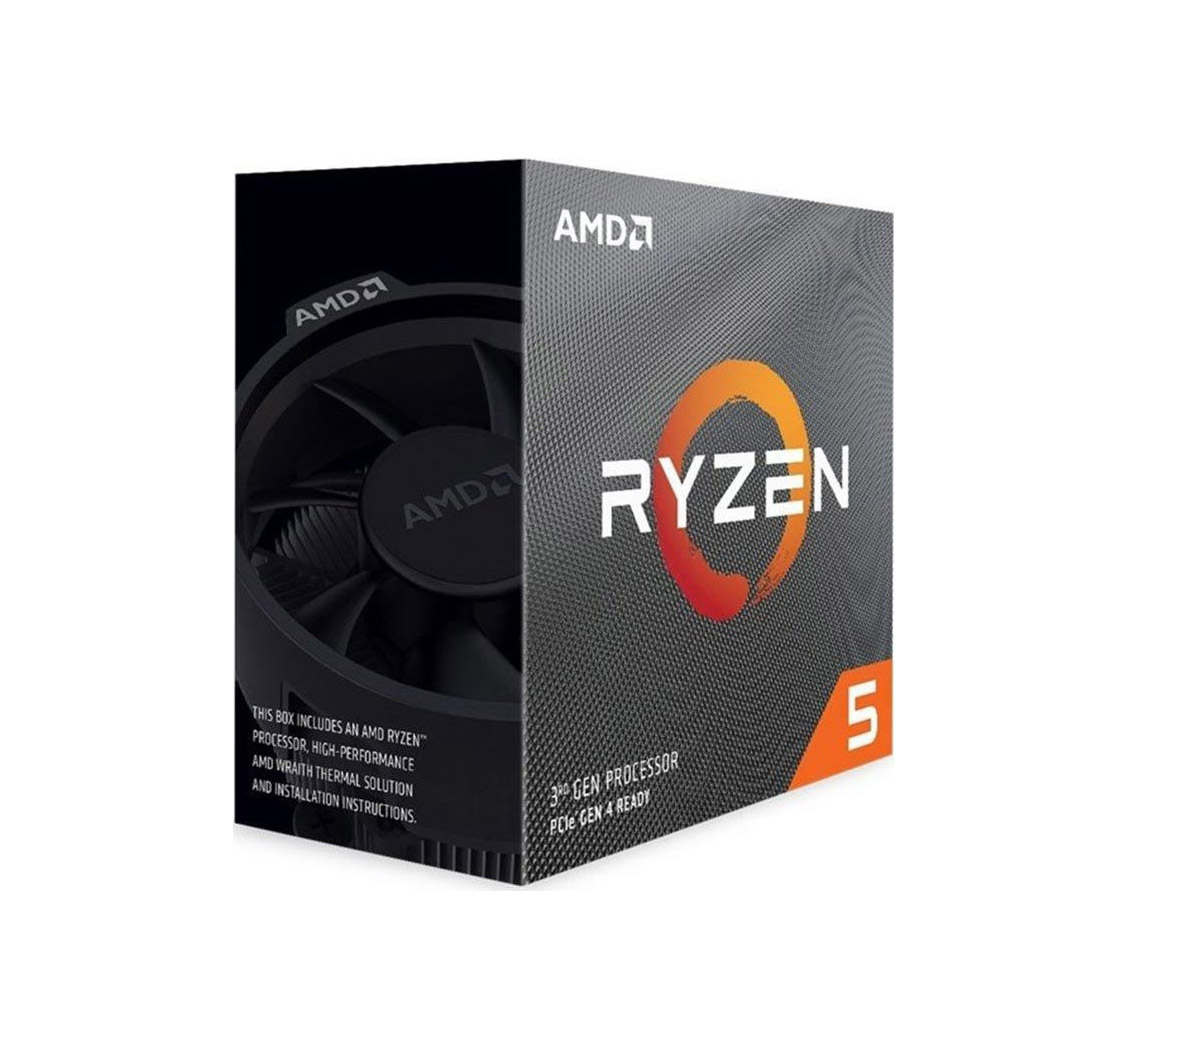 AMD Ryzen 5 3600 Box Επεξεργαστής Πληρωμή έως 24 δόσεις*